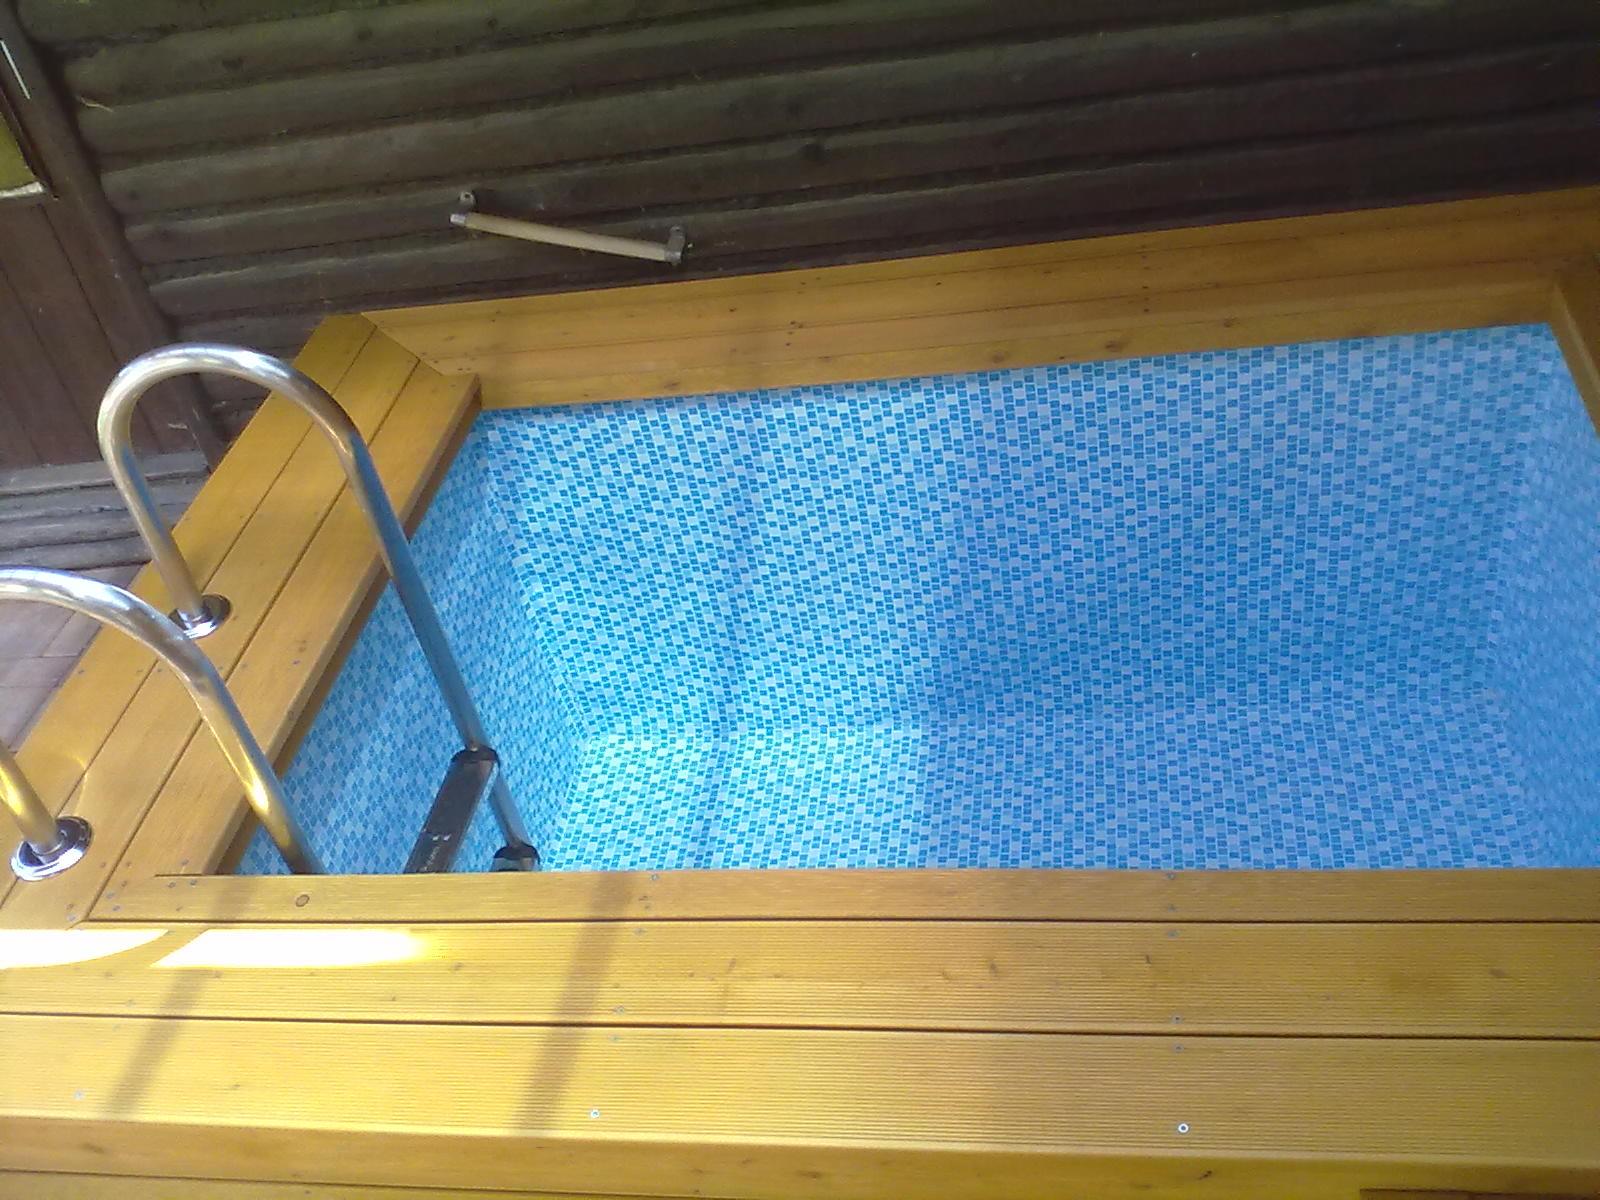 Nymburk bazének u sauny